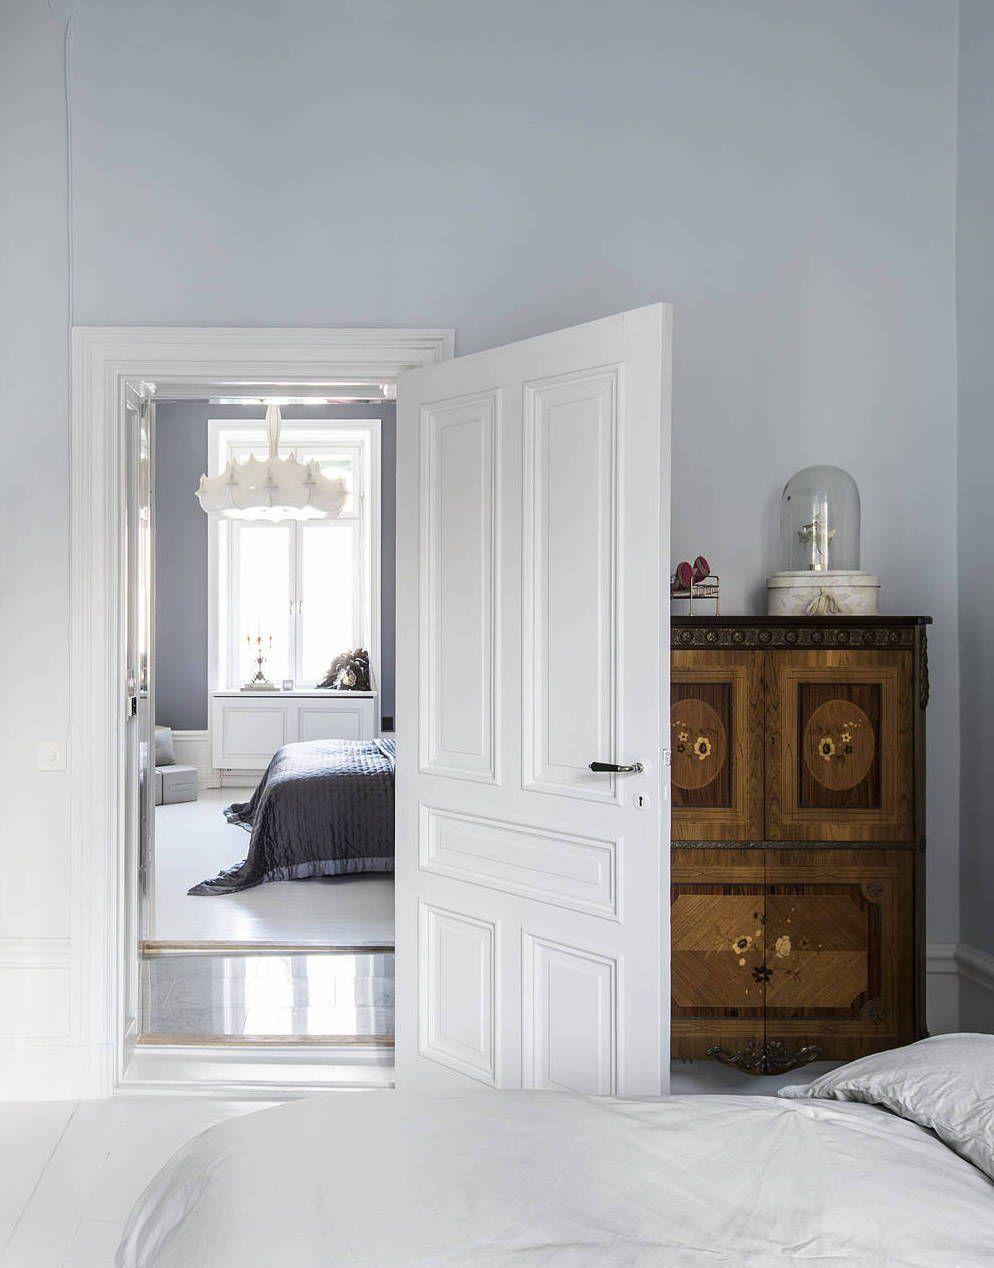 2 bedroom interior design classy home in black and white  decor and design  pinterest